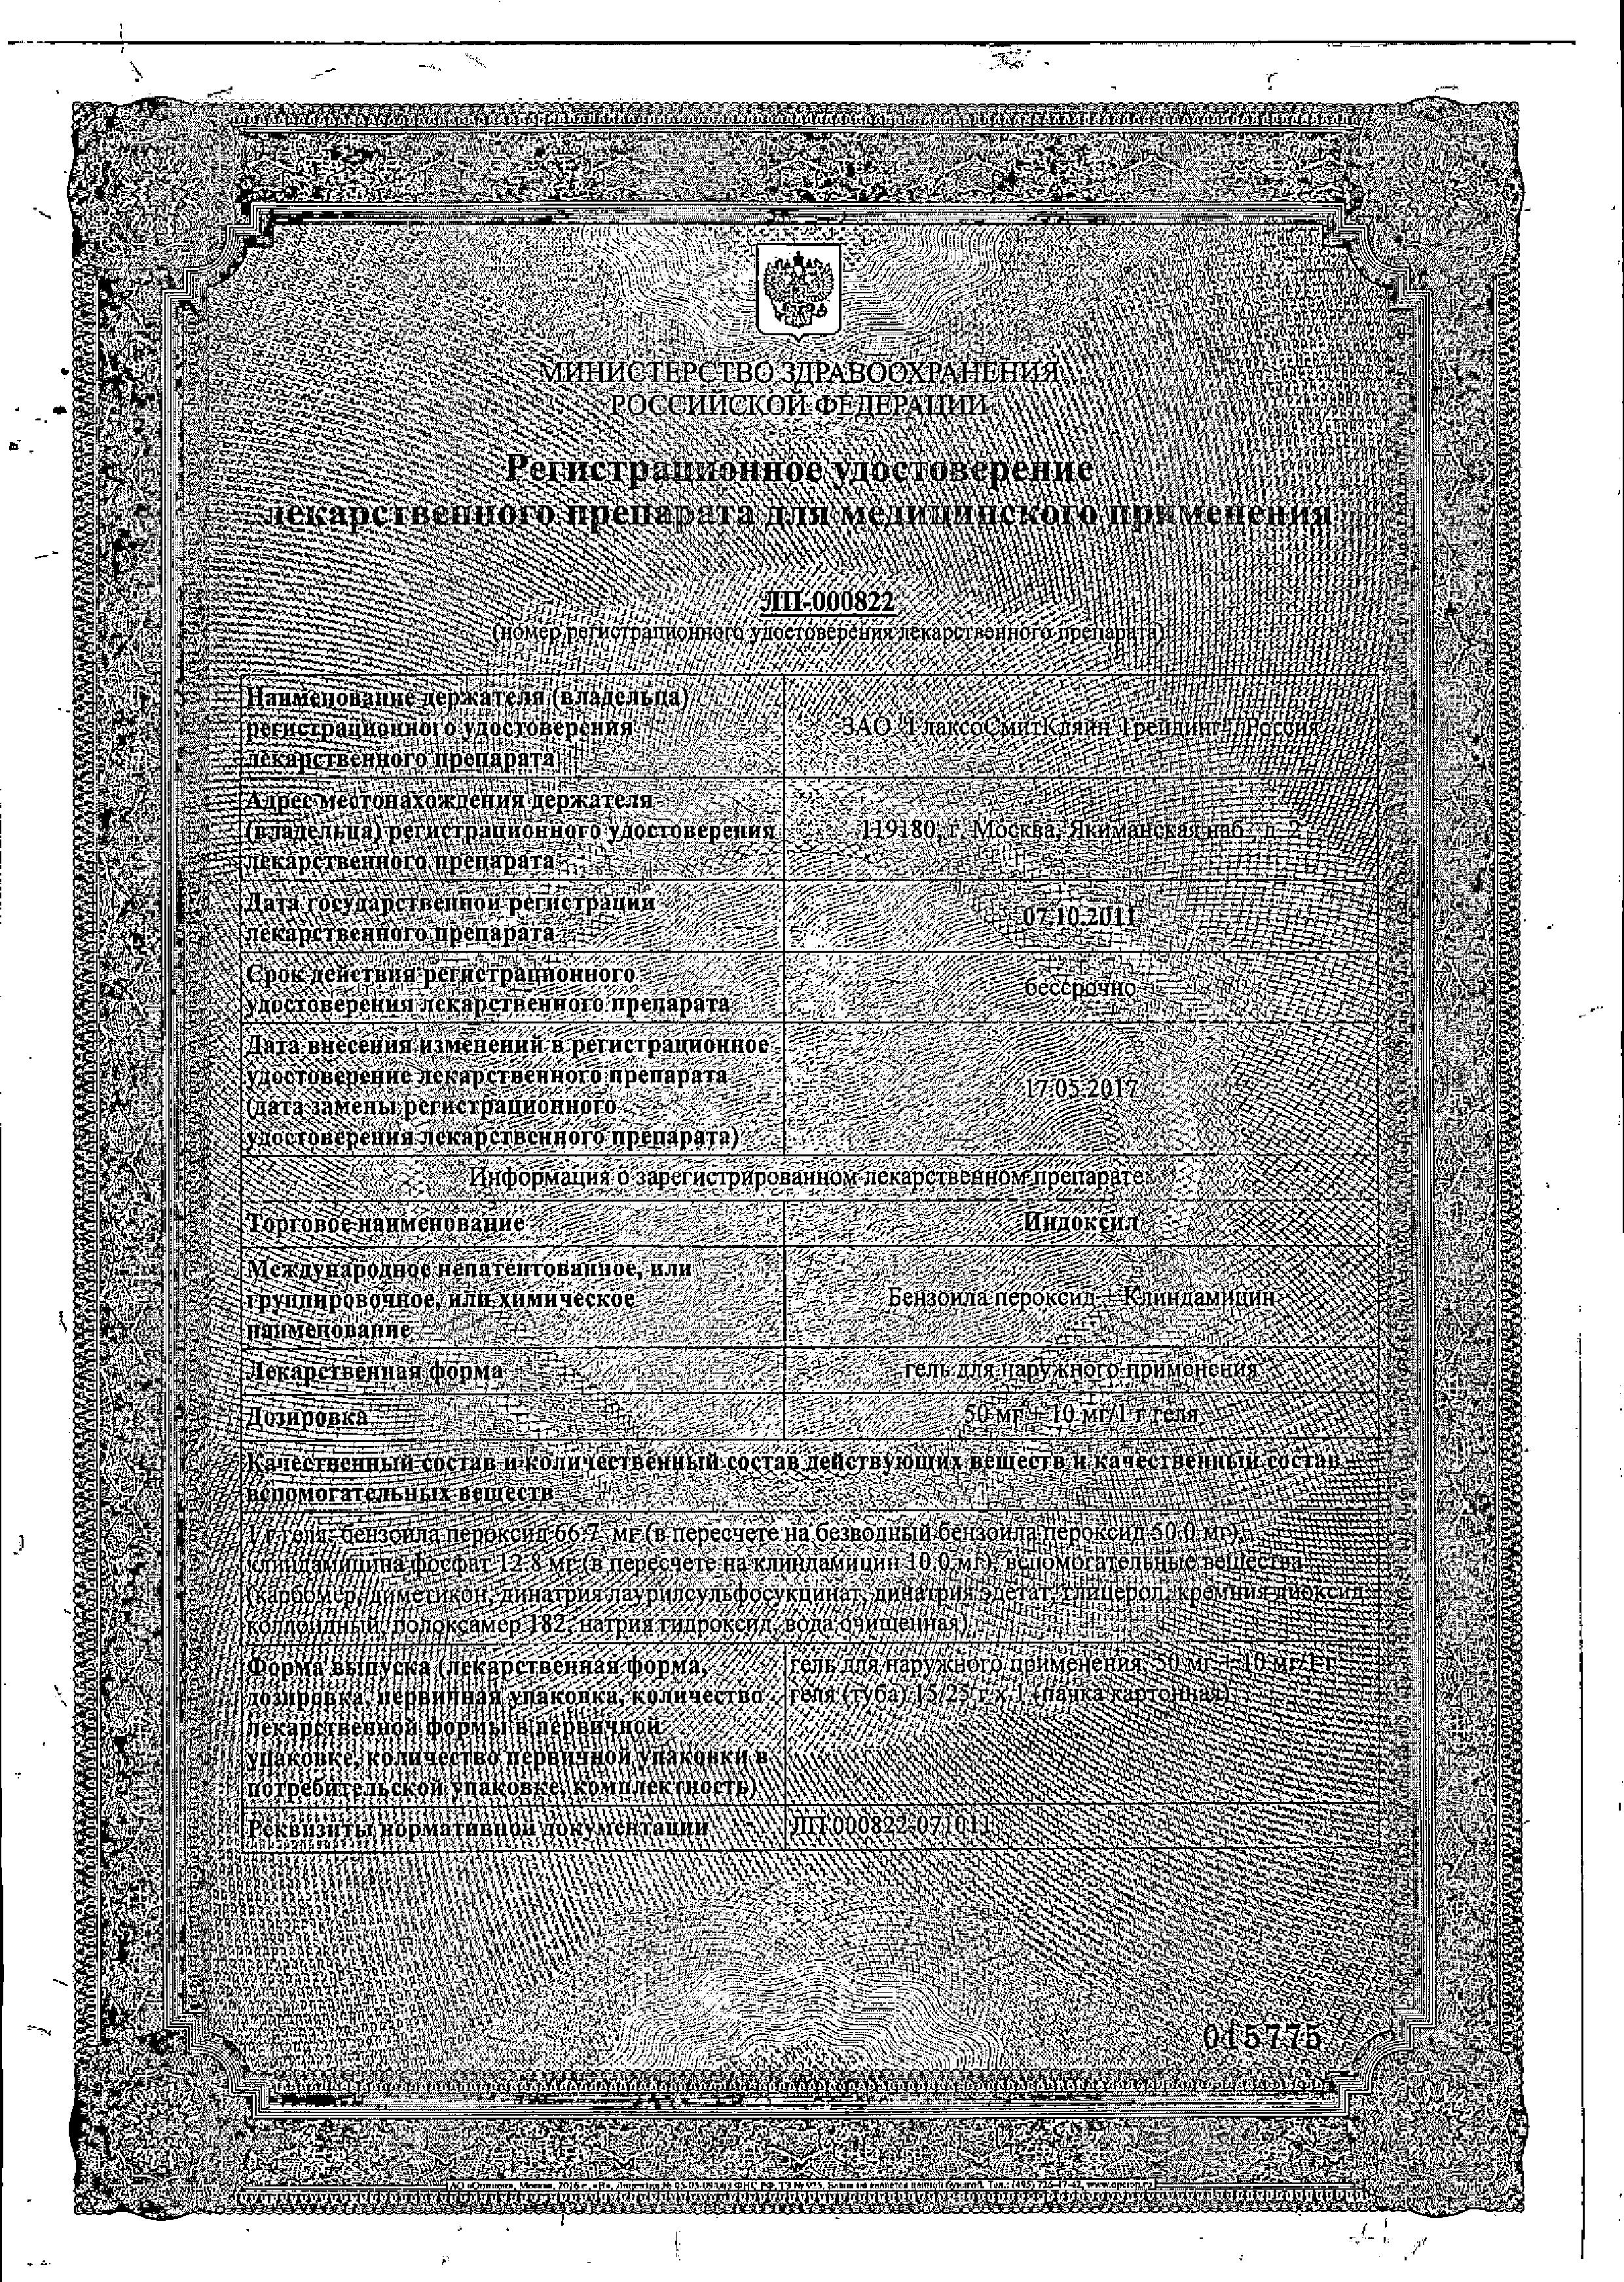 Индоксил сертификат